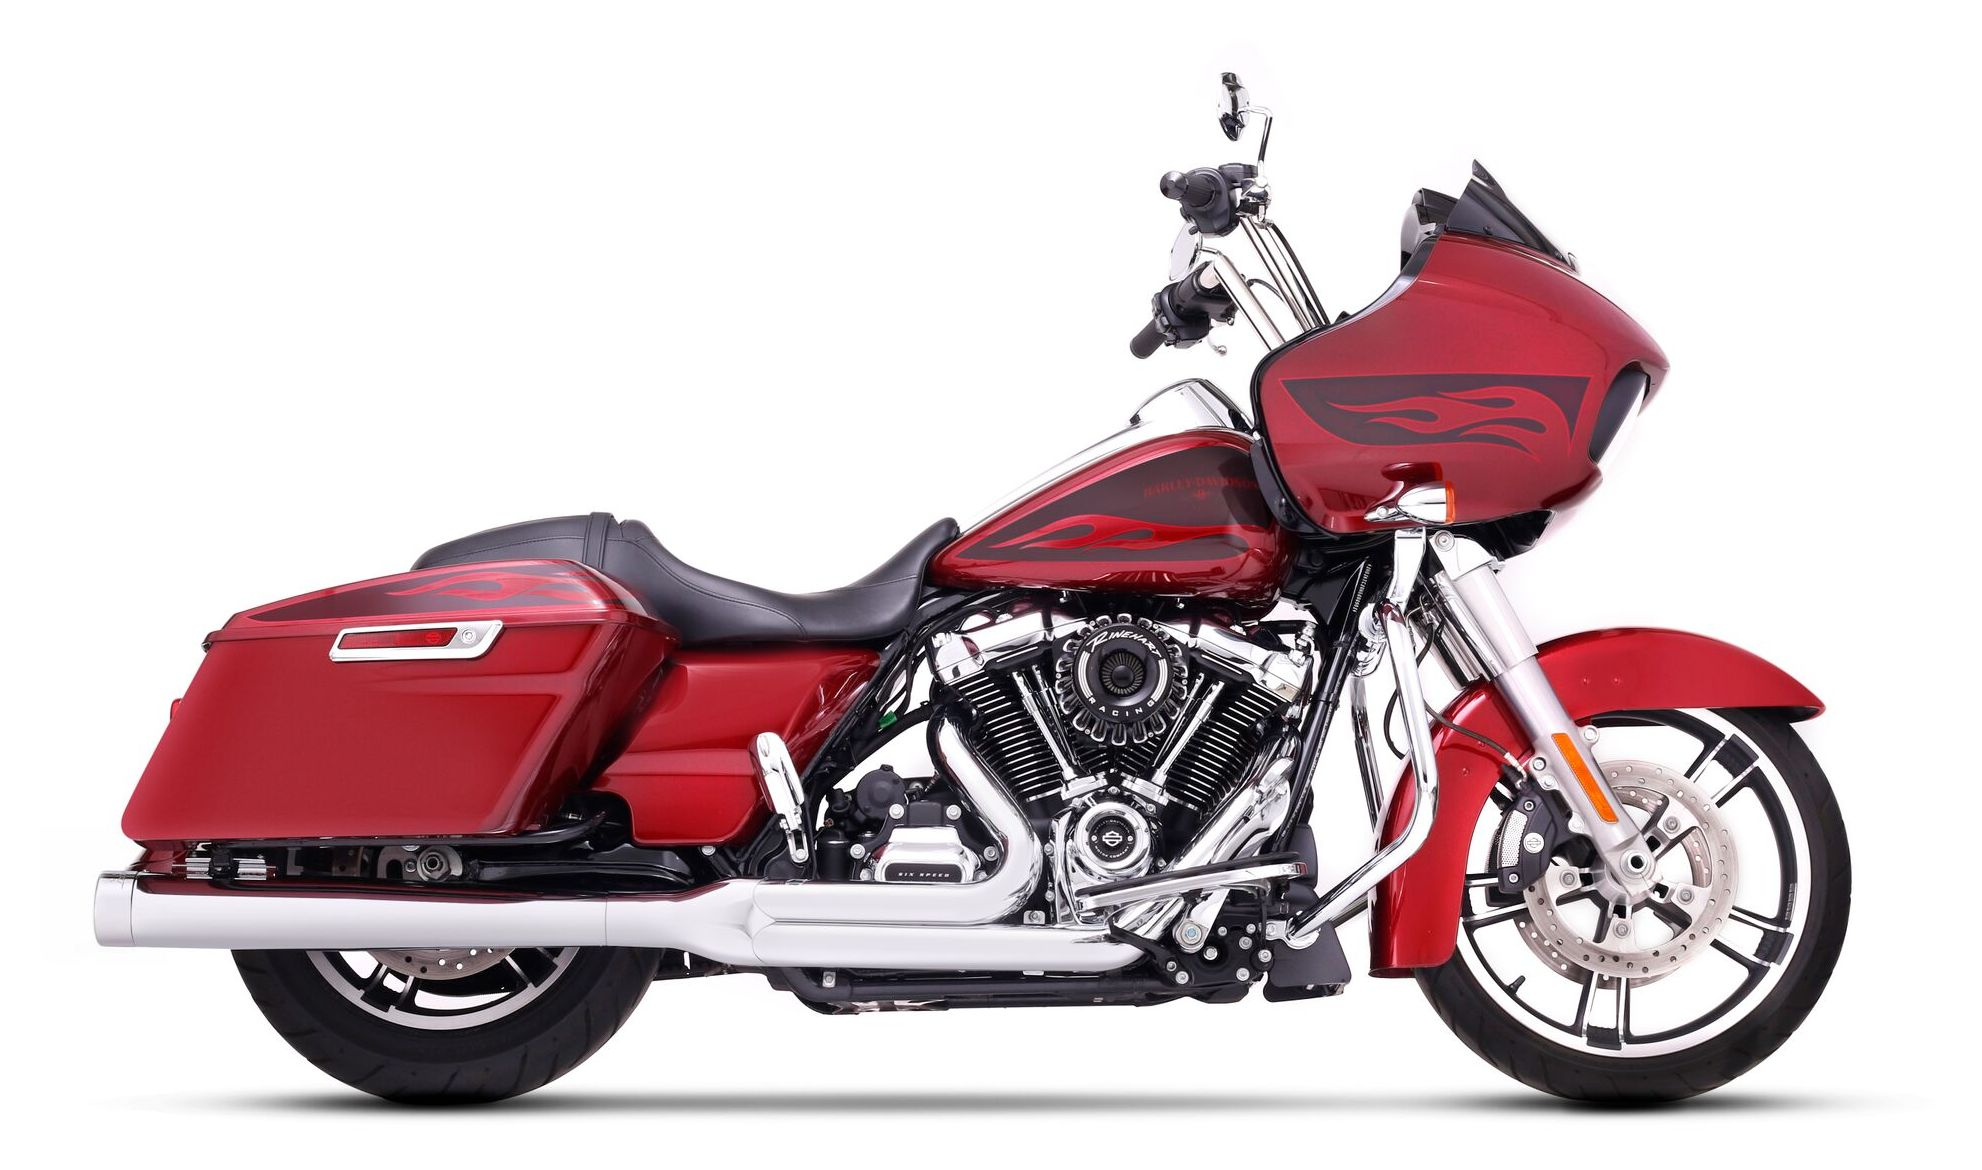 In Fashion Style Motorcycle Highway Engine Guard Crash Bar Protector For Harley Davidson Touring Road King Electra Street Glide 1997-2008 1999 Novel Design;